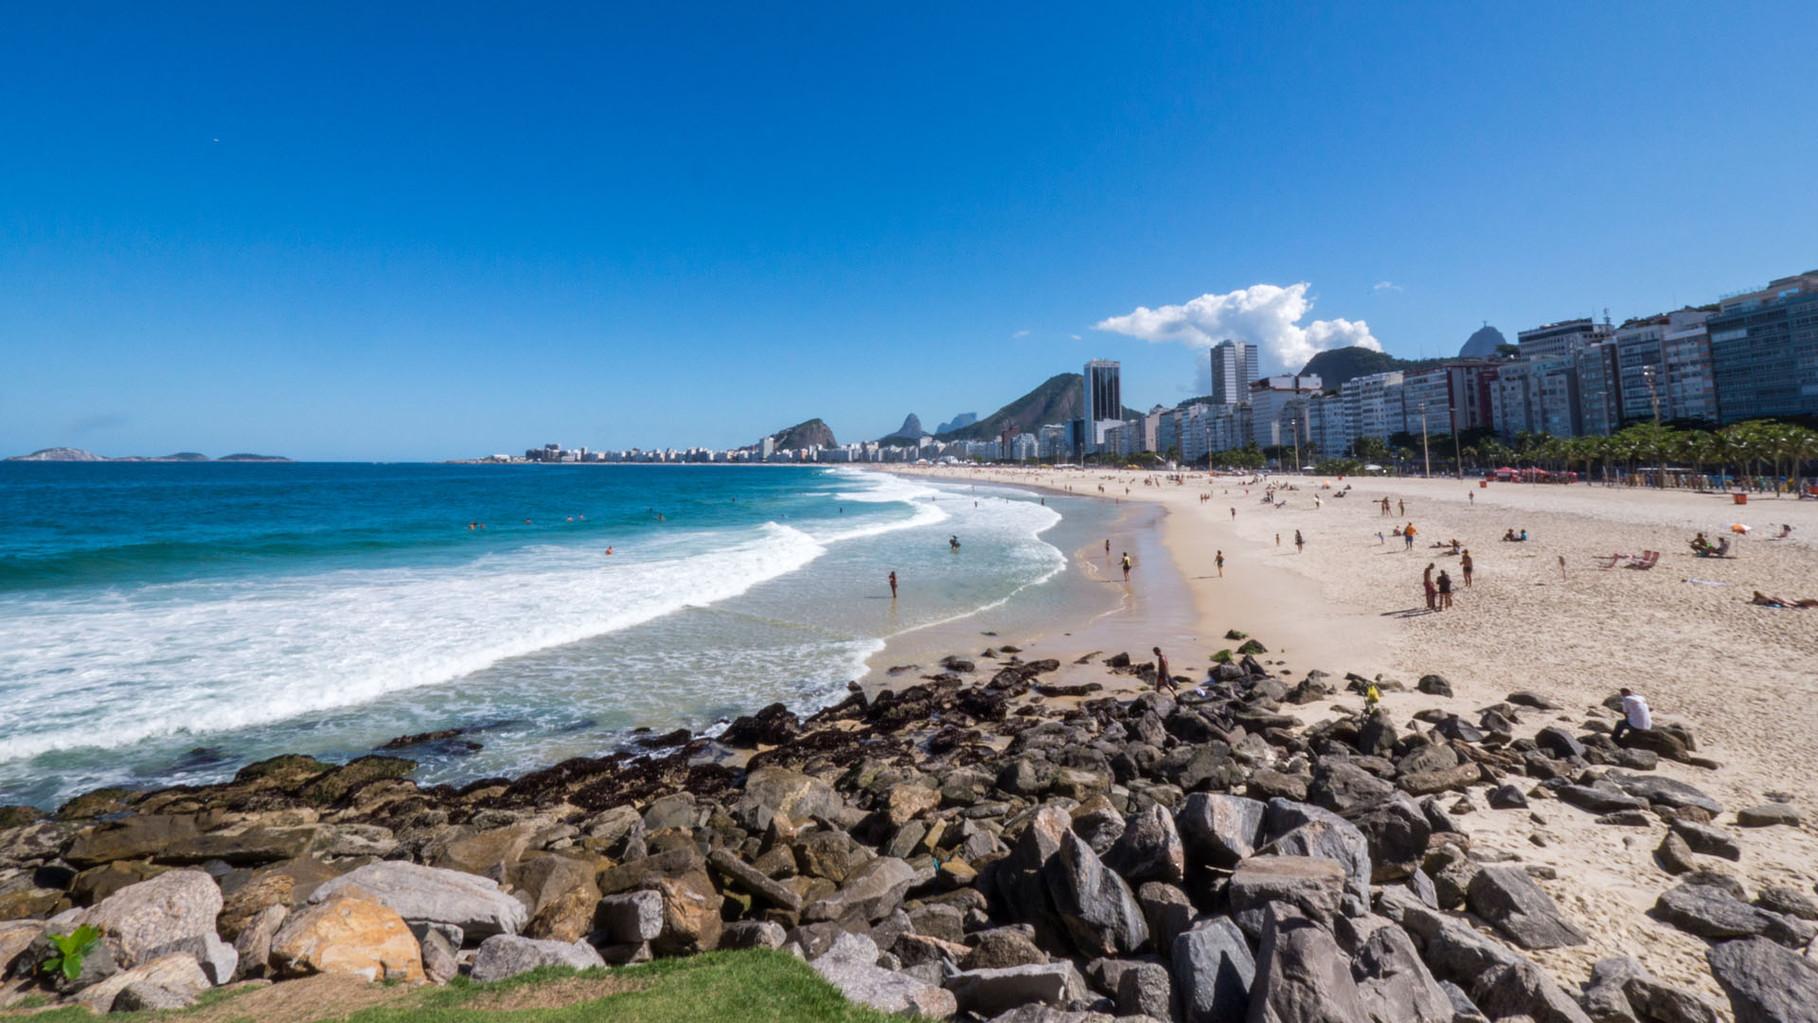 Copacabana, Rio de Janeiro [Brazil, 2014]